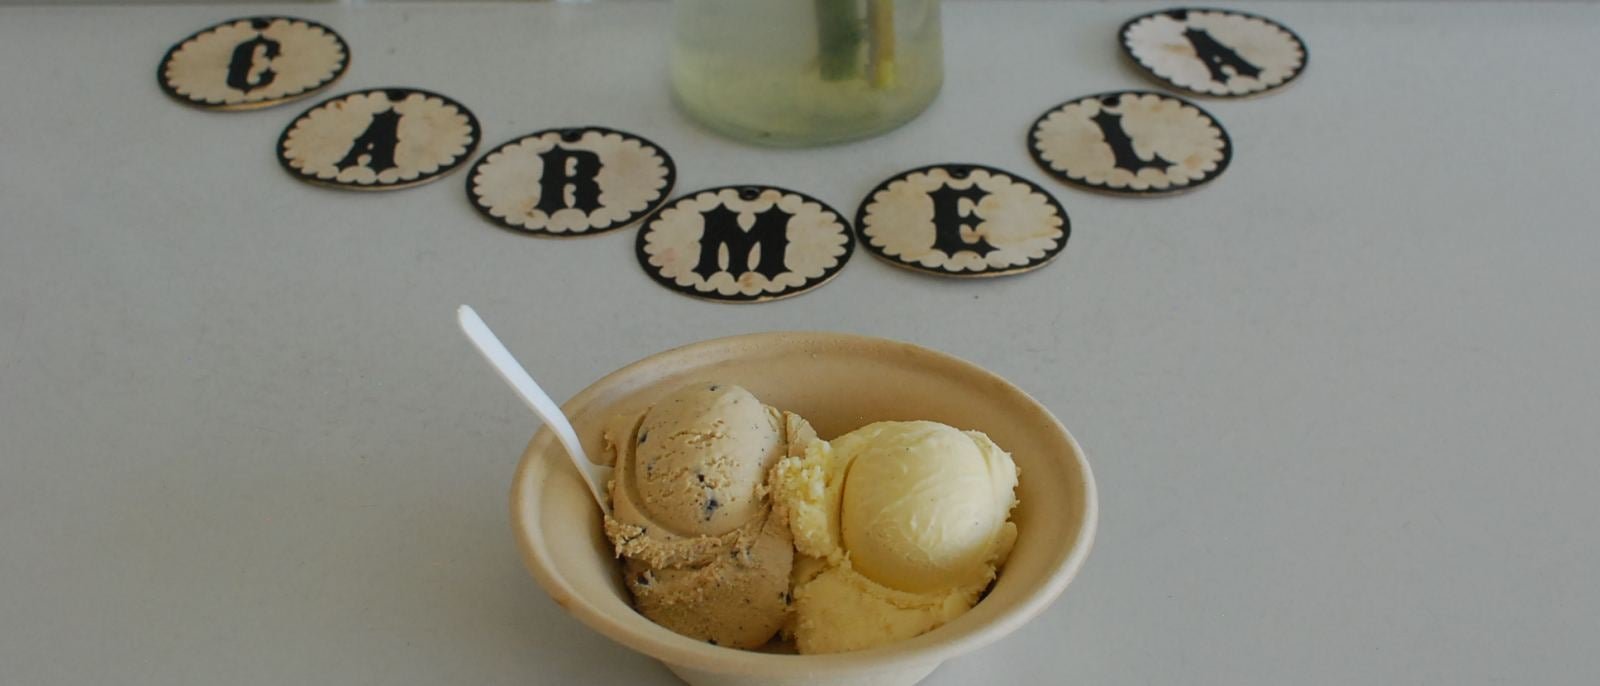 Carmela Ice Cream Espresso Vanilla